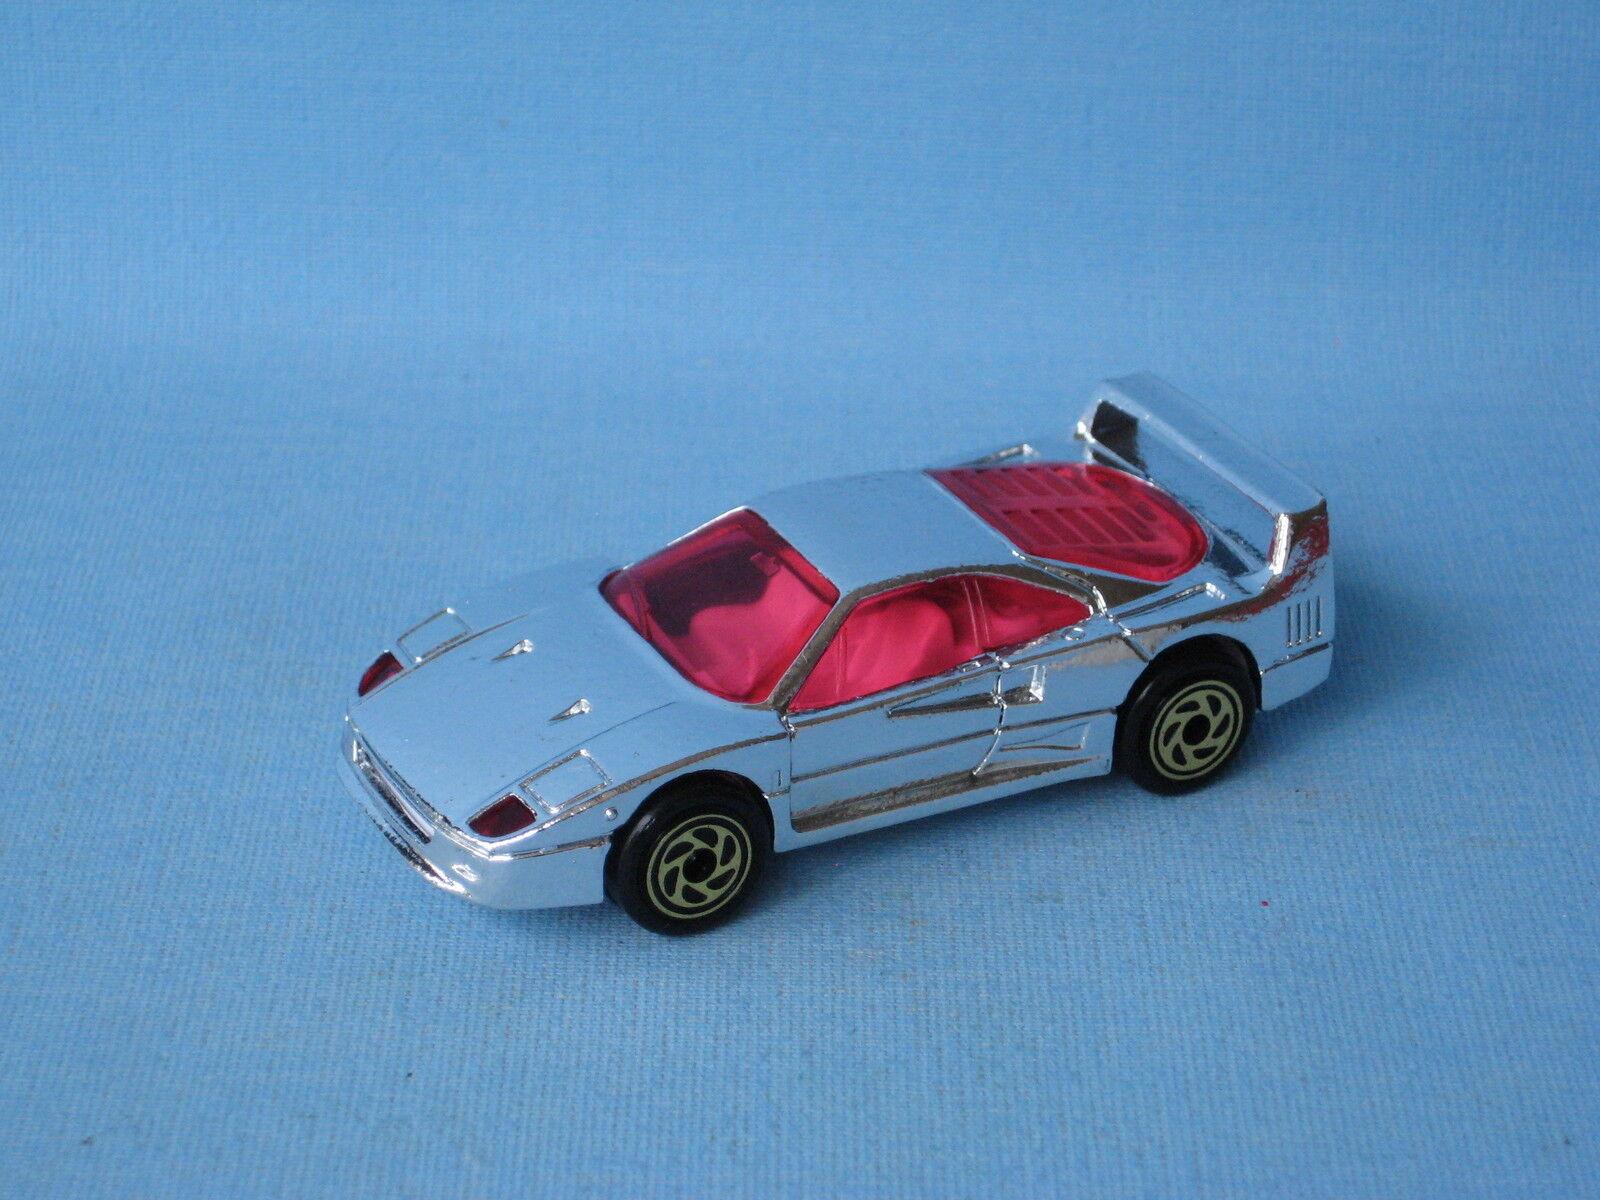 Matchbox Ferrari F40 Unreleased Chrome Version Pre-Pro 75mm